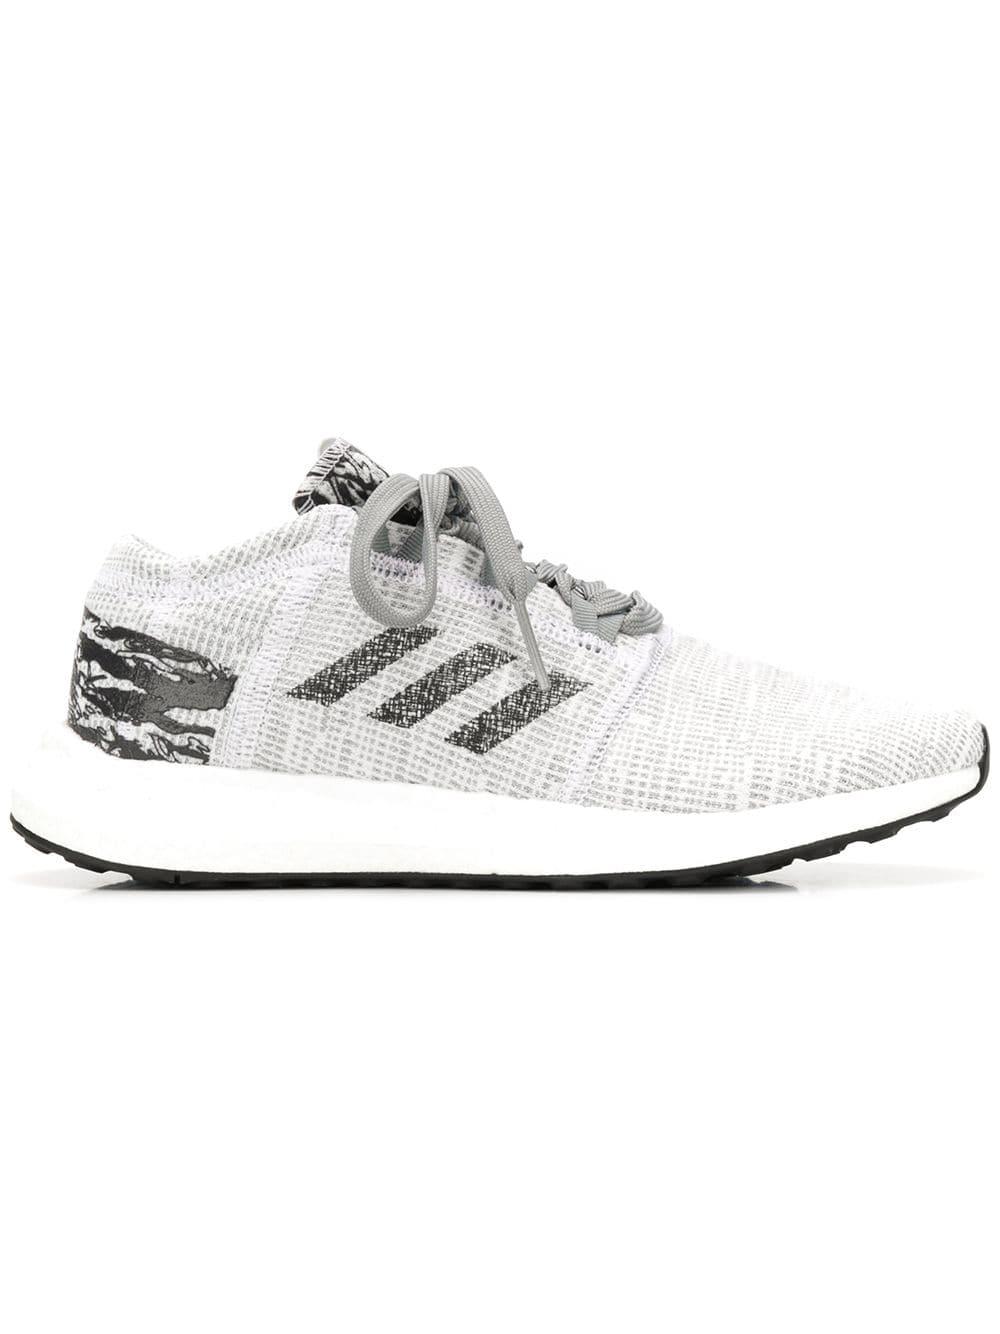 916032652b165 Adidas Originals Adidas Adidas X Undefeated Pureboost Go Sneakers - Grey